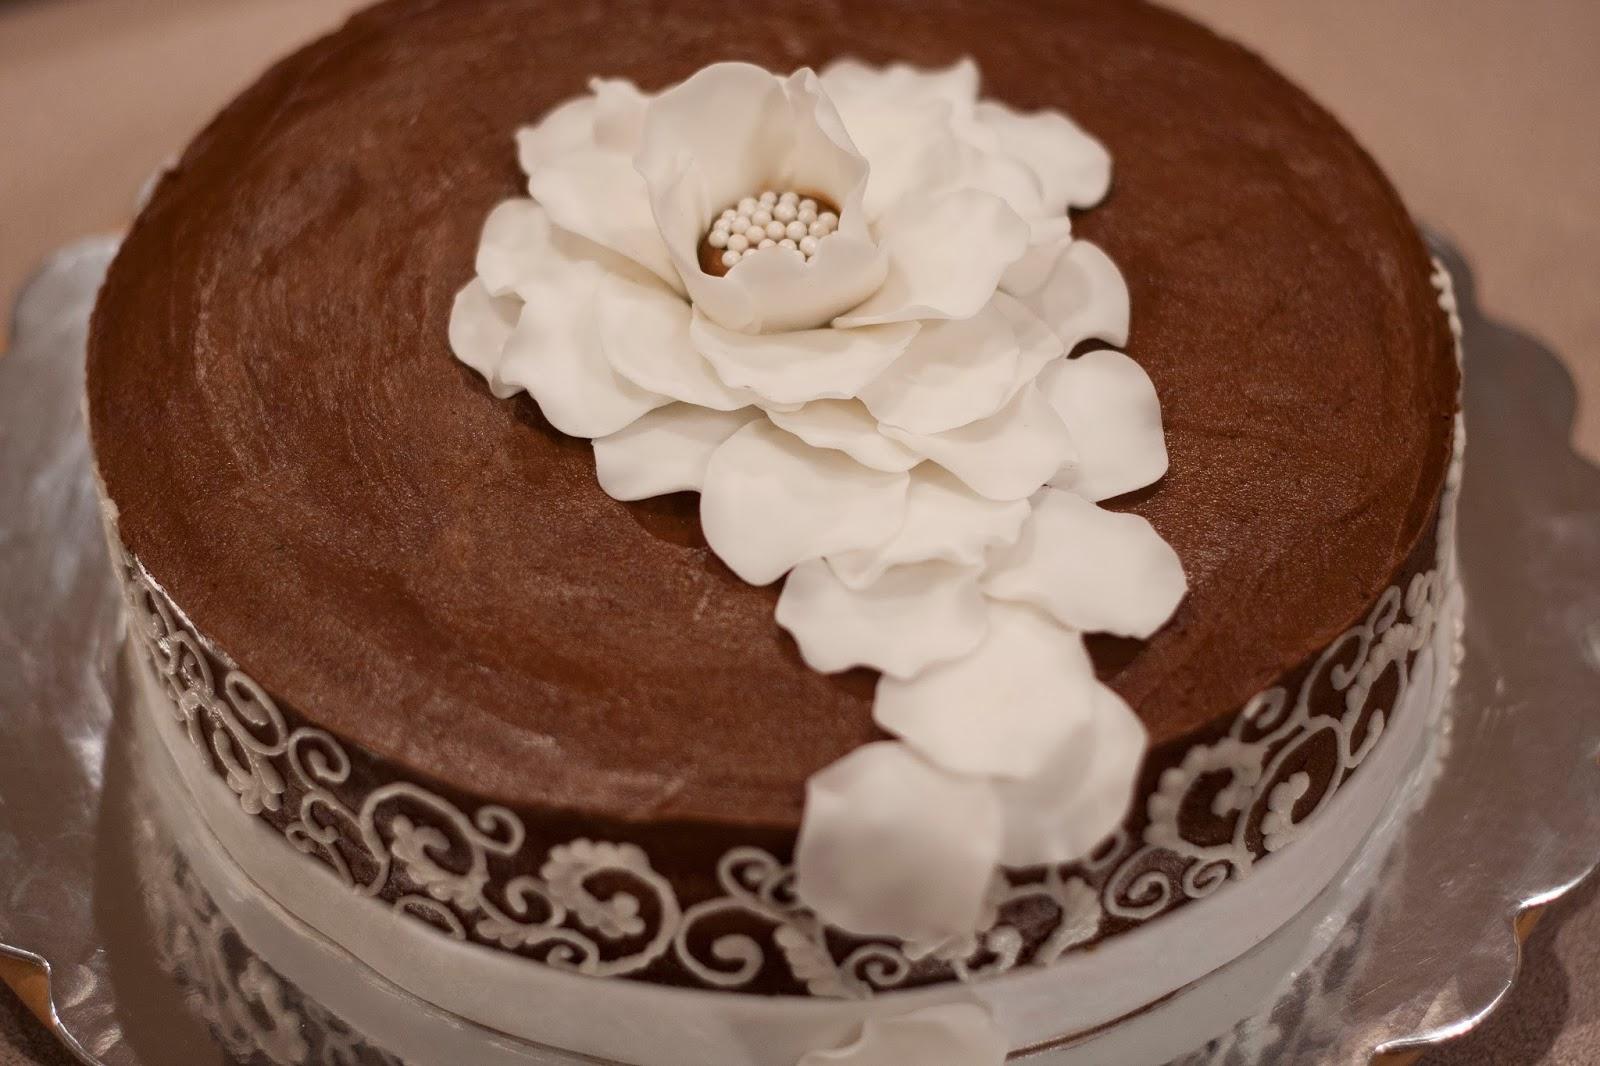 Heathers Sweet Cakes White Rose On Chocolate Birthday Cake